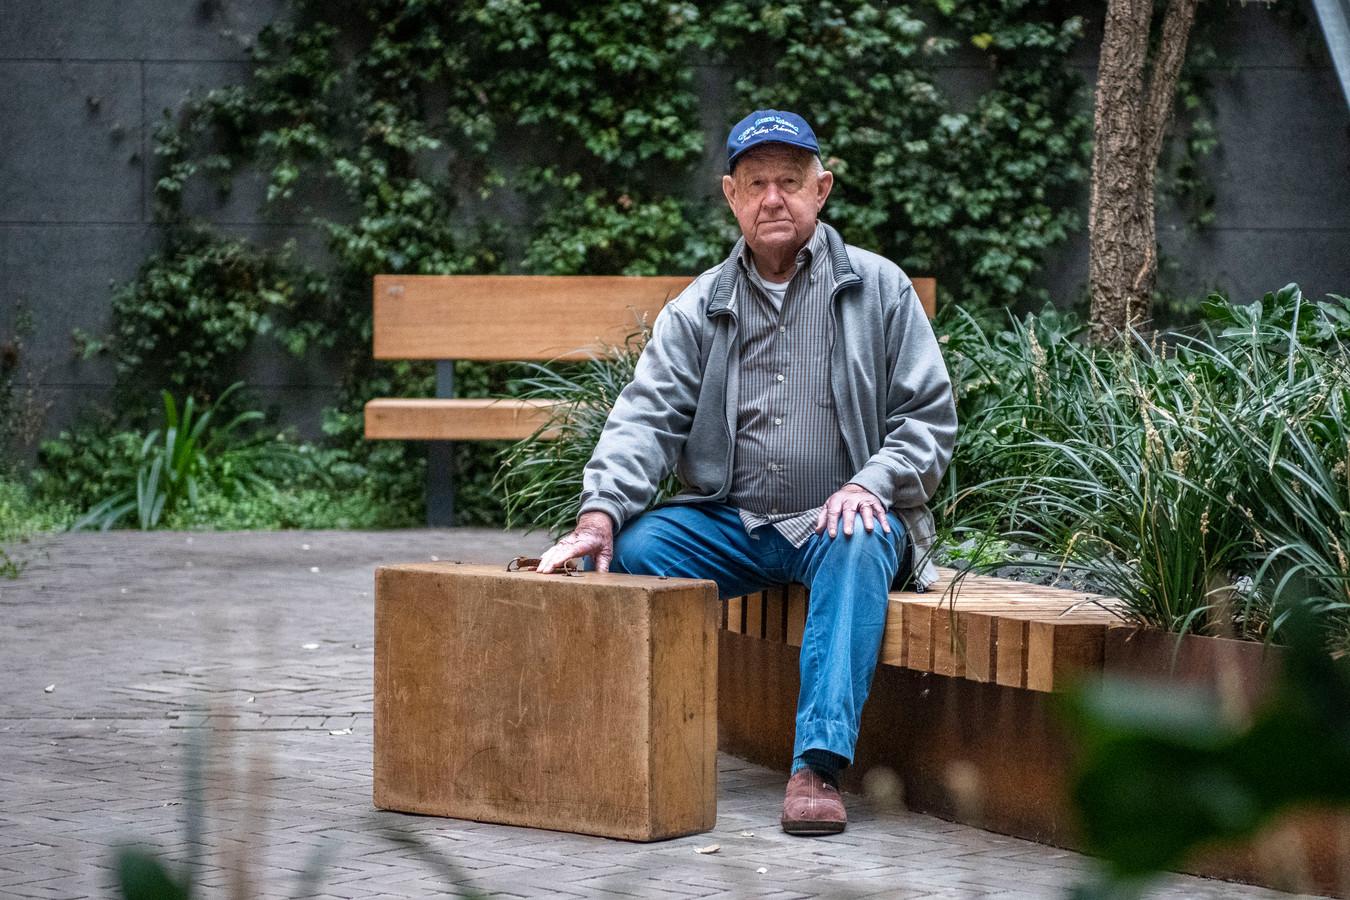 Oorlogsgetuige Jan Rottier met zijn zelfgemaakte koffer, die overal met hem mee ging.